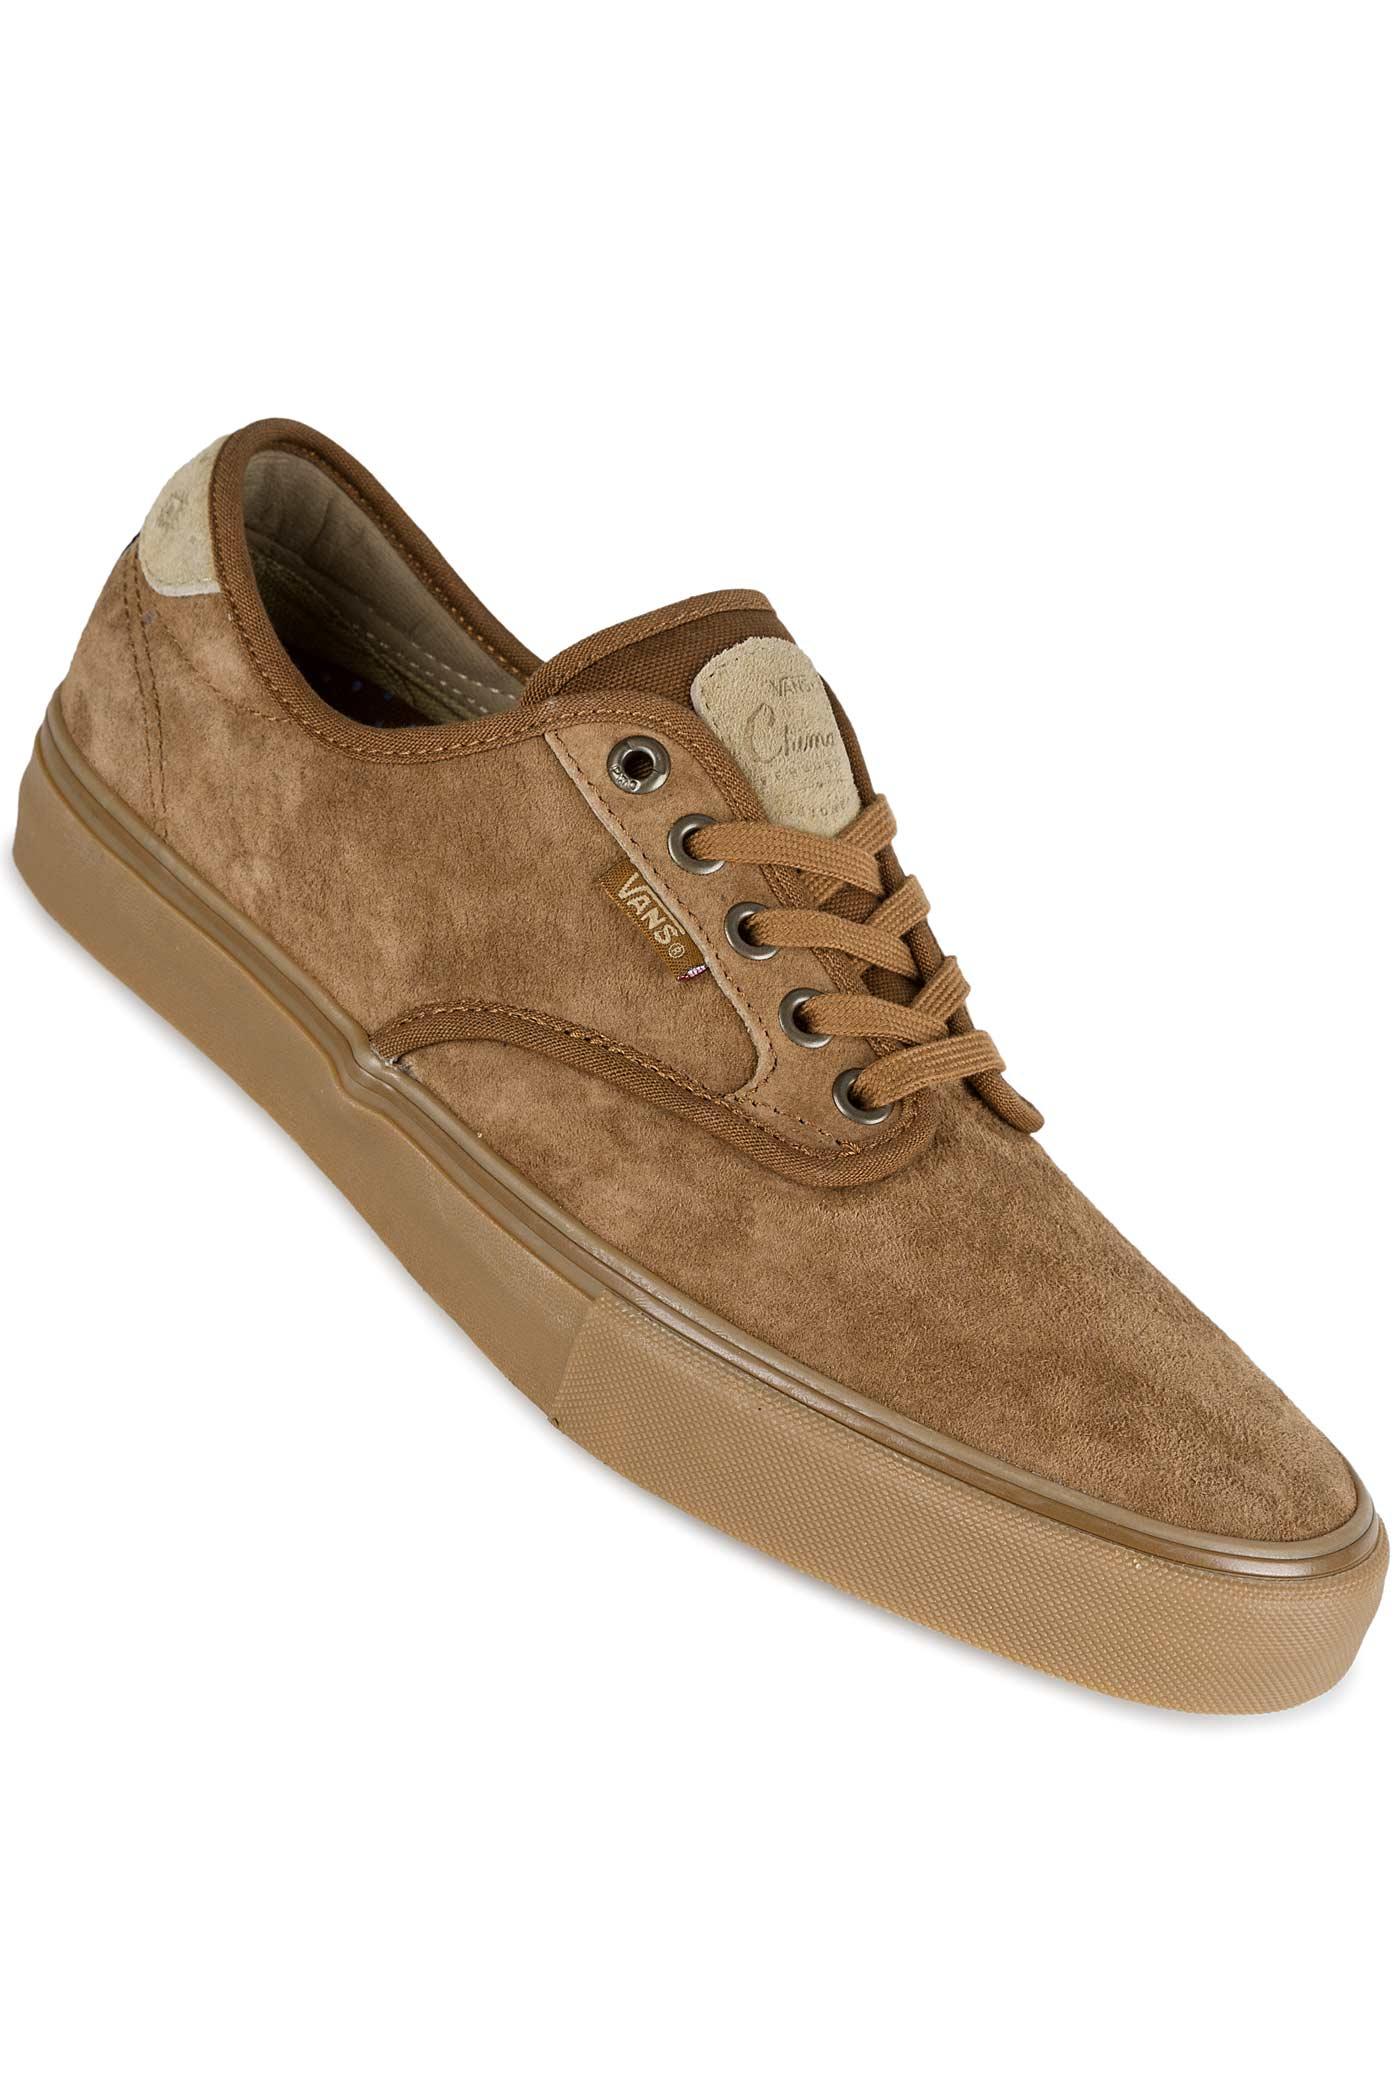 4b4a78517b0 Vans Chima Ferguson Pro Chaussure (native dachshund gum) achetez sur ...